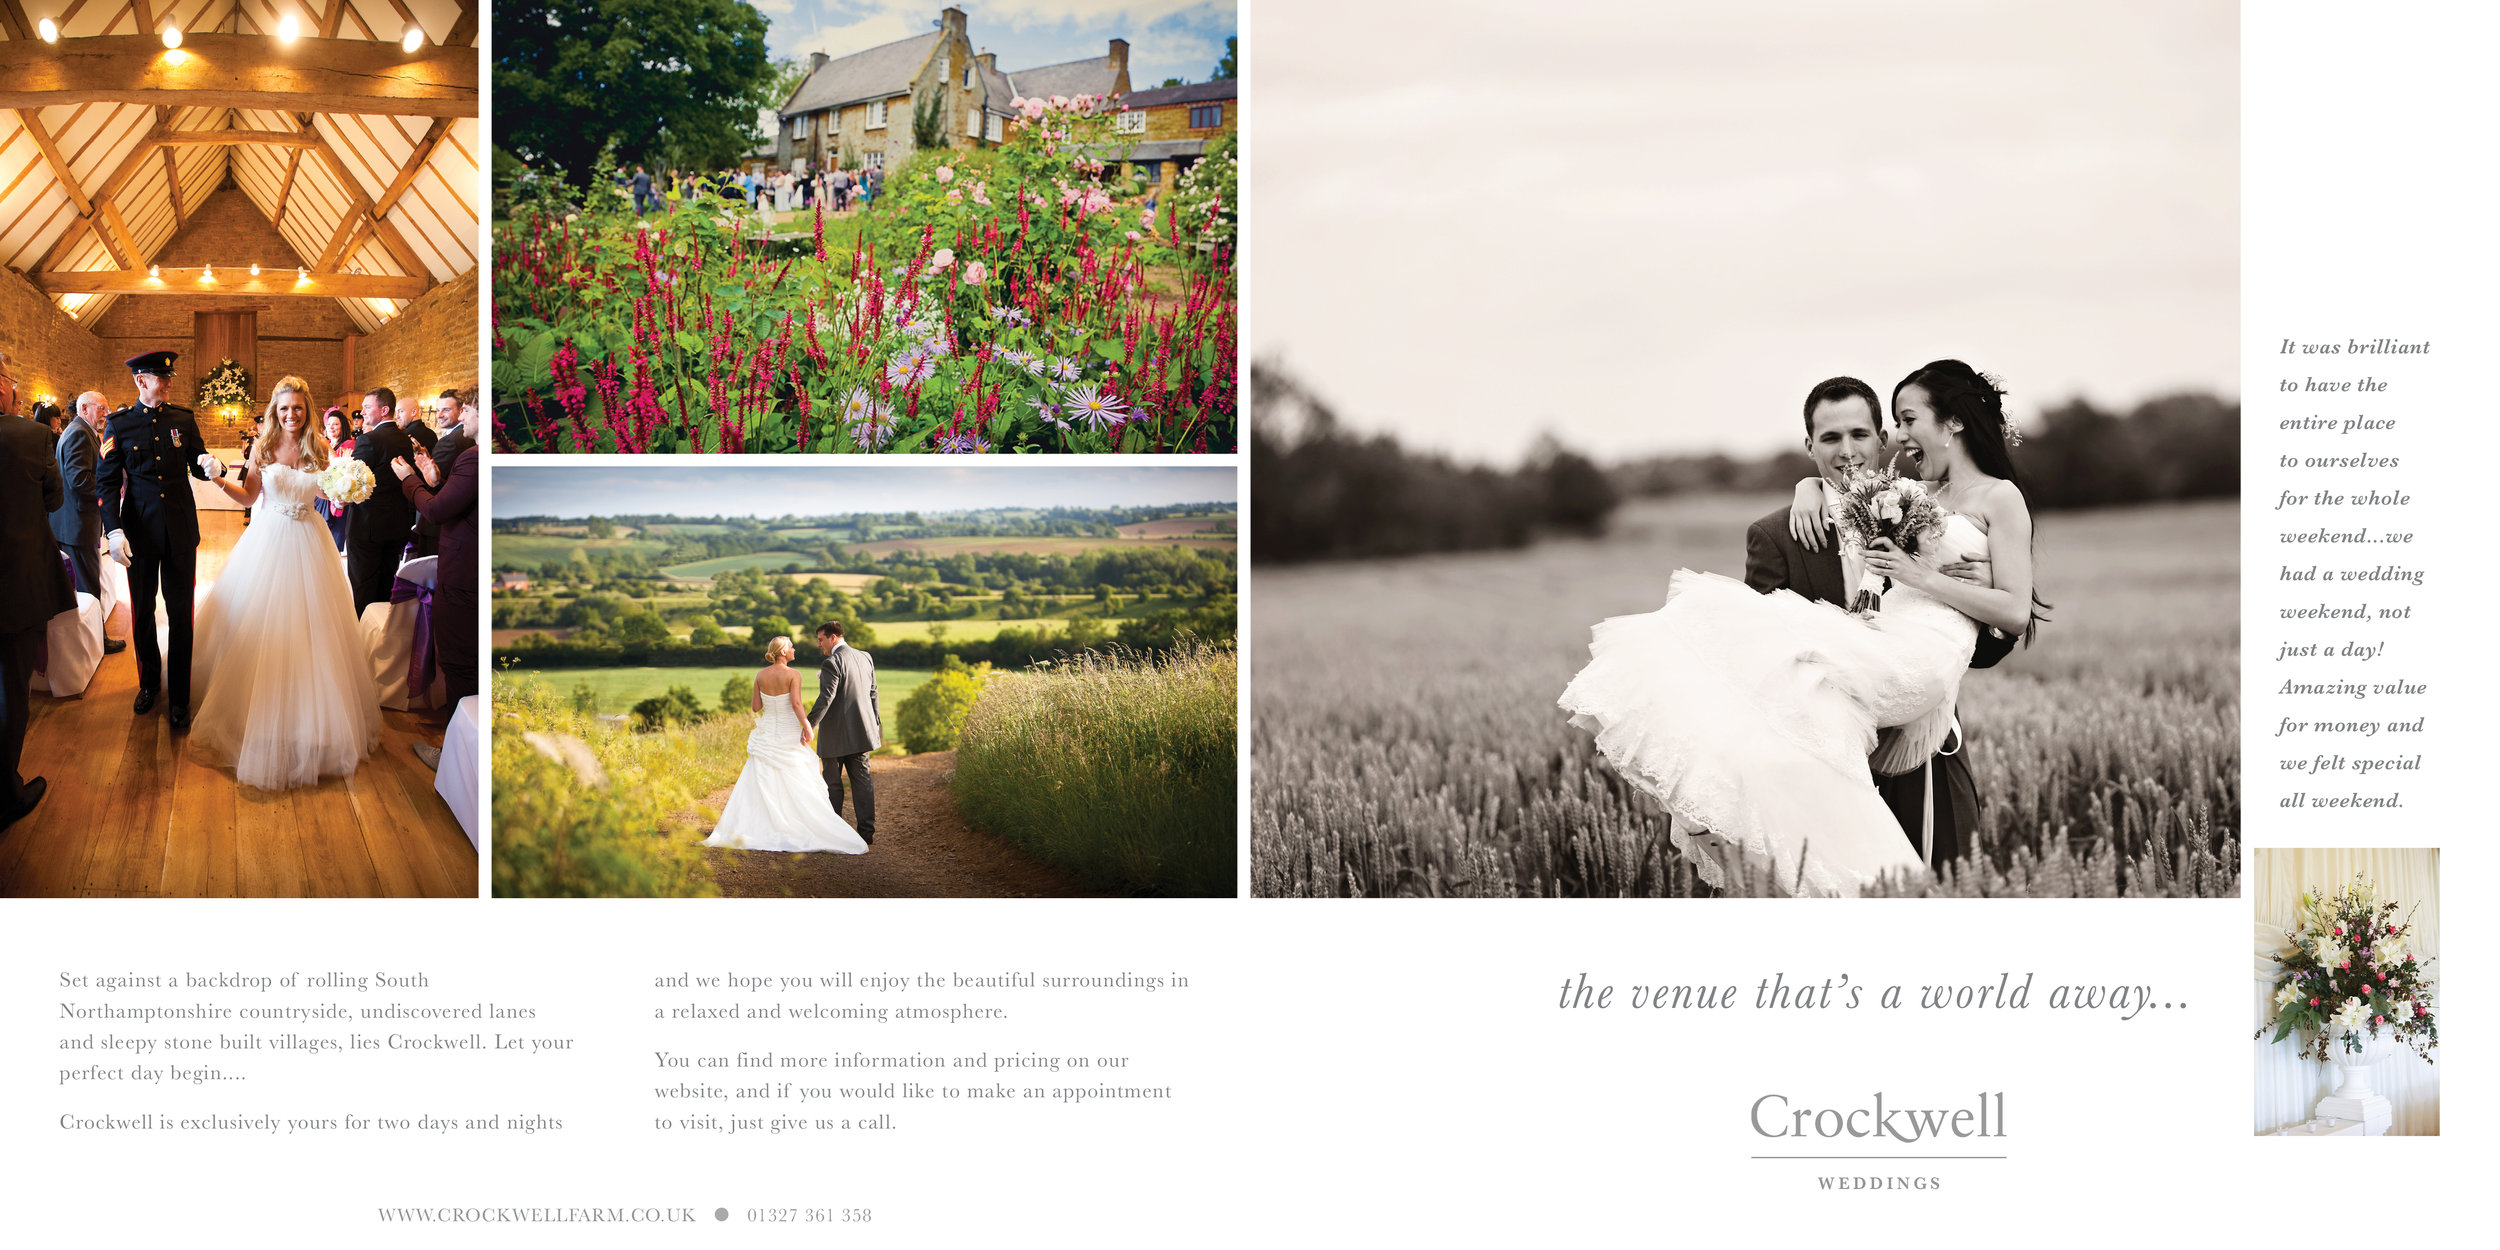 Crockerll Brochure 4 white2.jpg